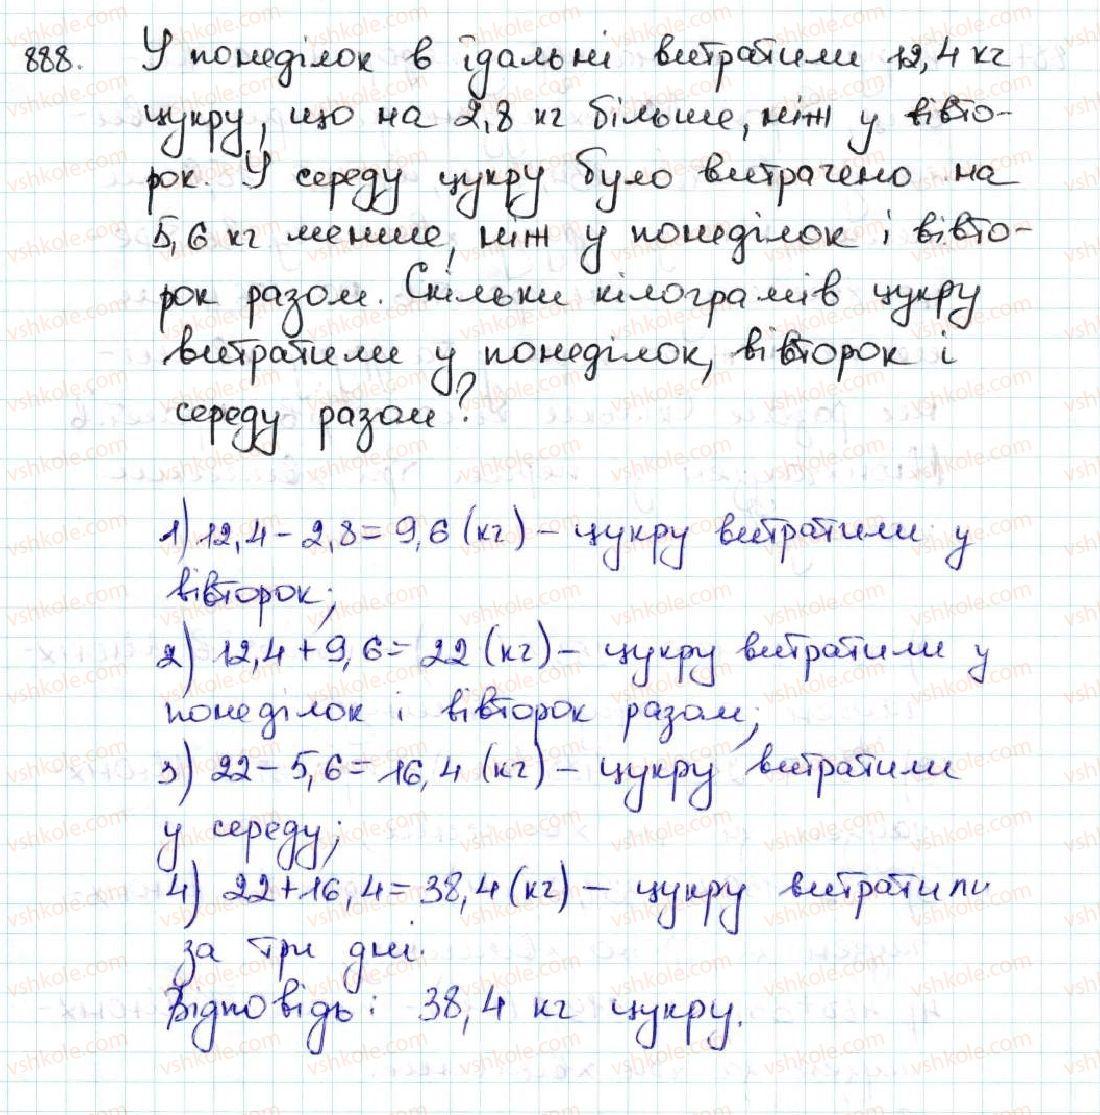 5-matematika-ag-merzlyak-vb-polonskij-ms-yakir-2013--5-desyatkovi-drobi-33-dodavannya-i-vidnimannya-desyatkovih-drobiv-888.jpg